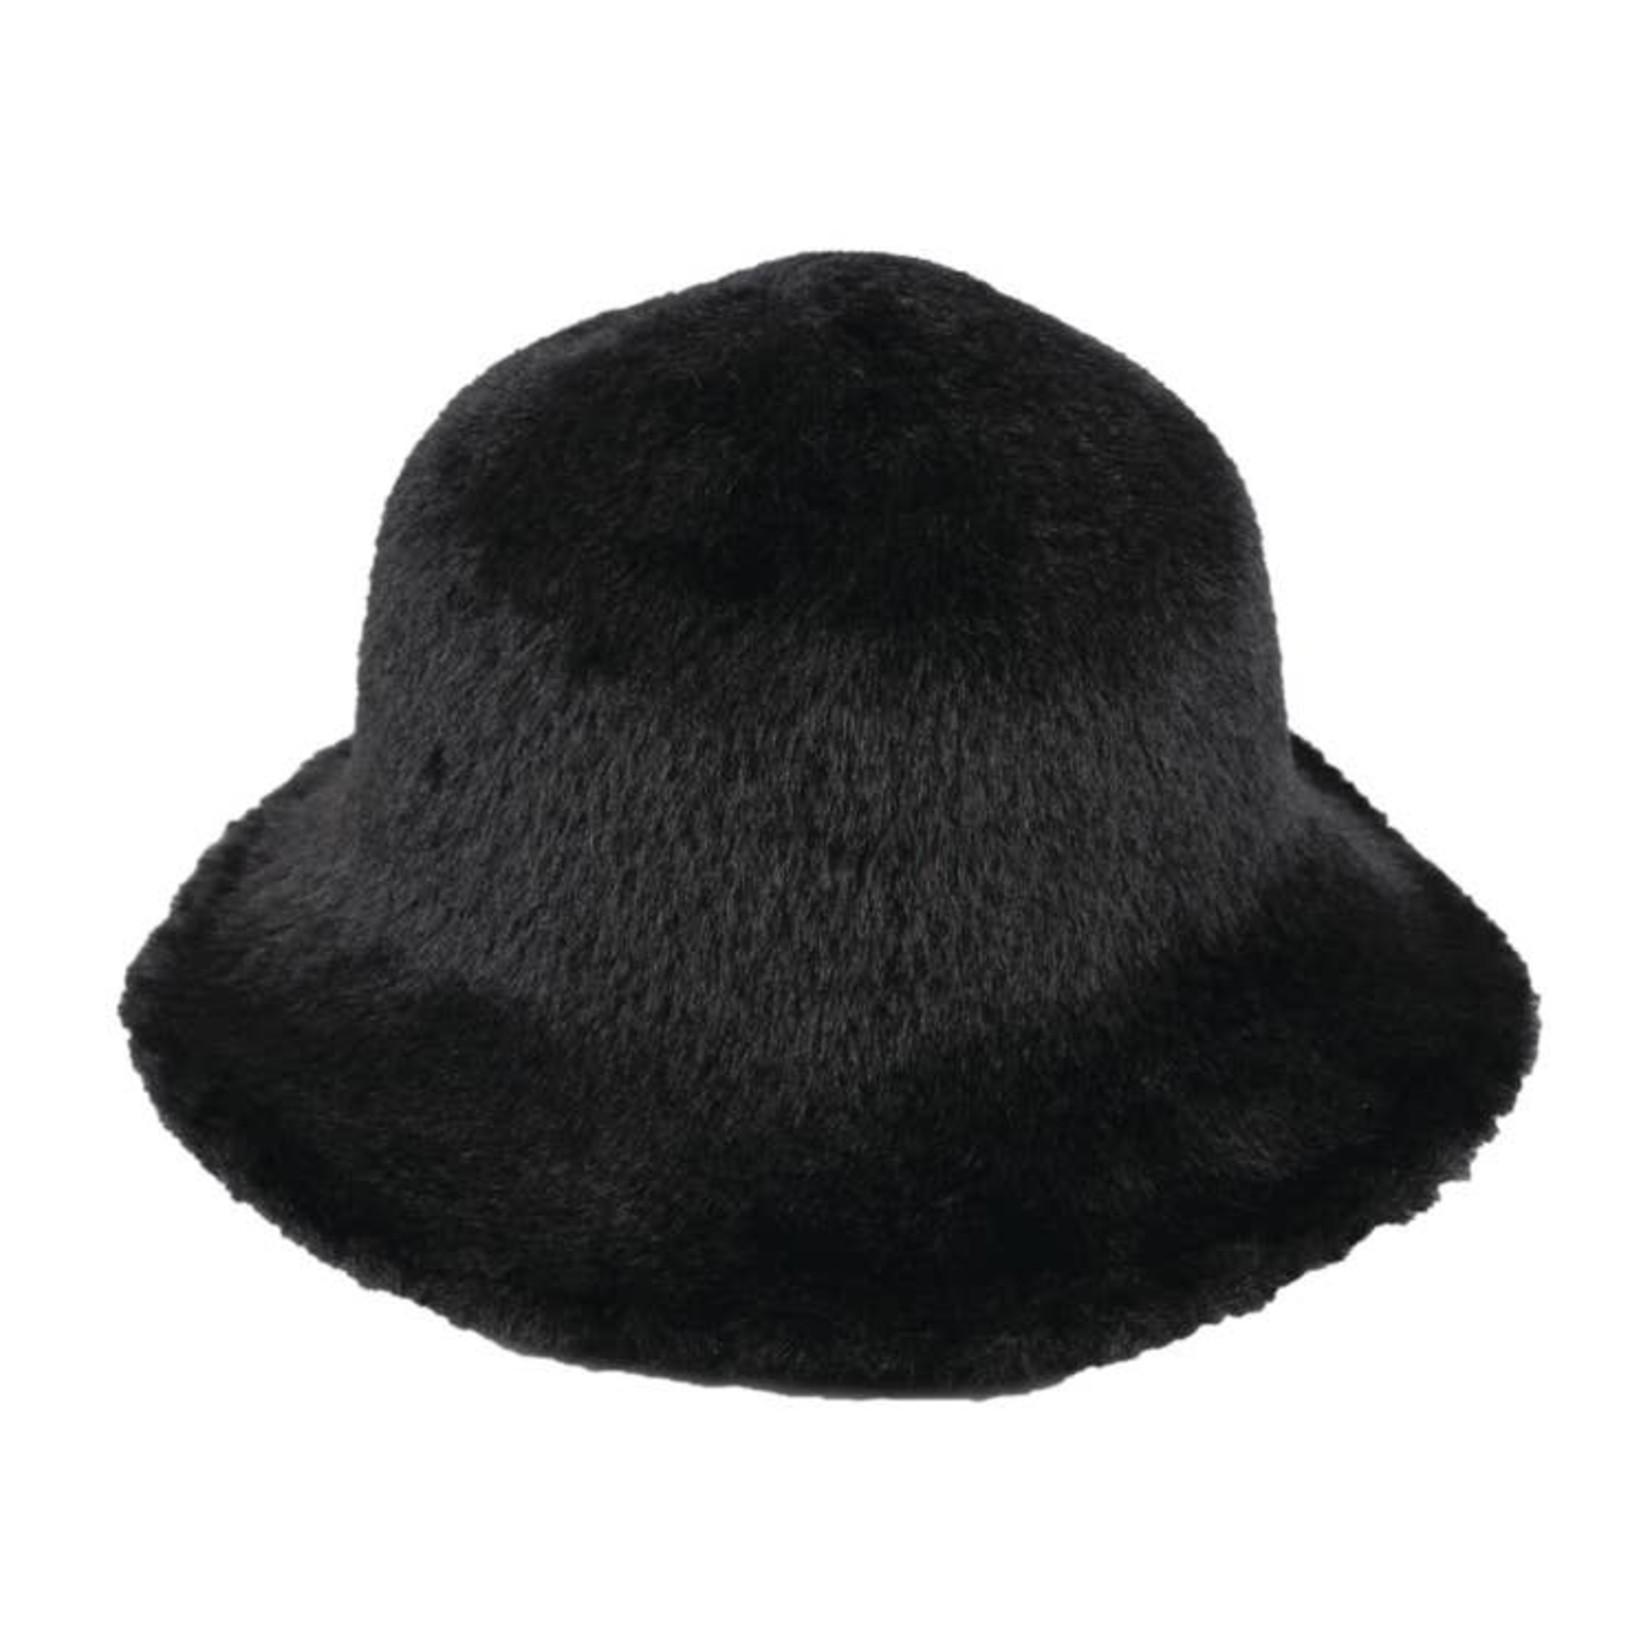 Jeanne Simmons Fuzzy Wire Adjustable Brim Hat - Black